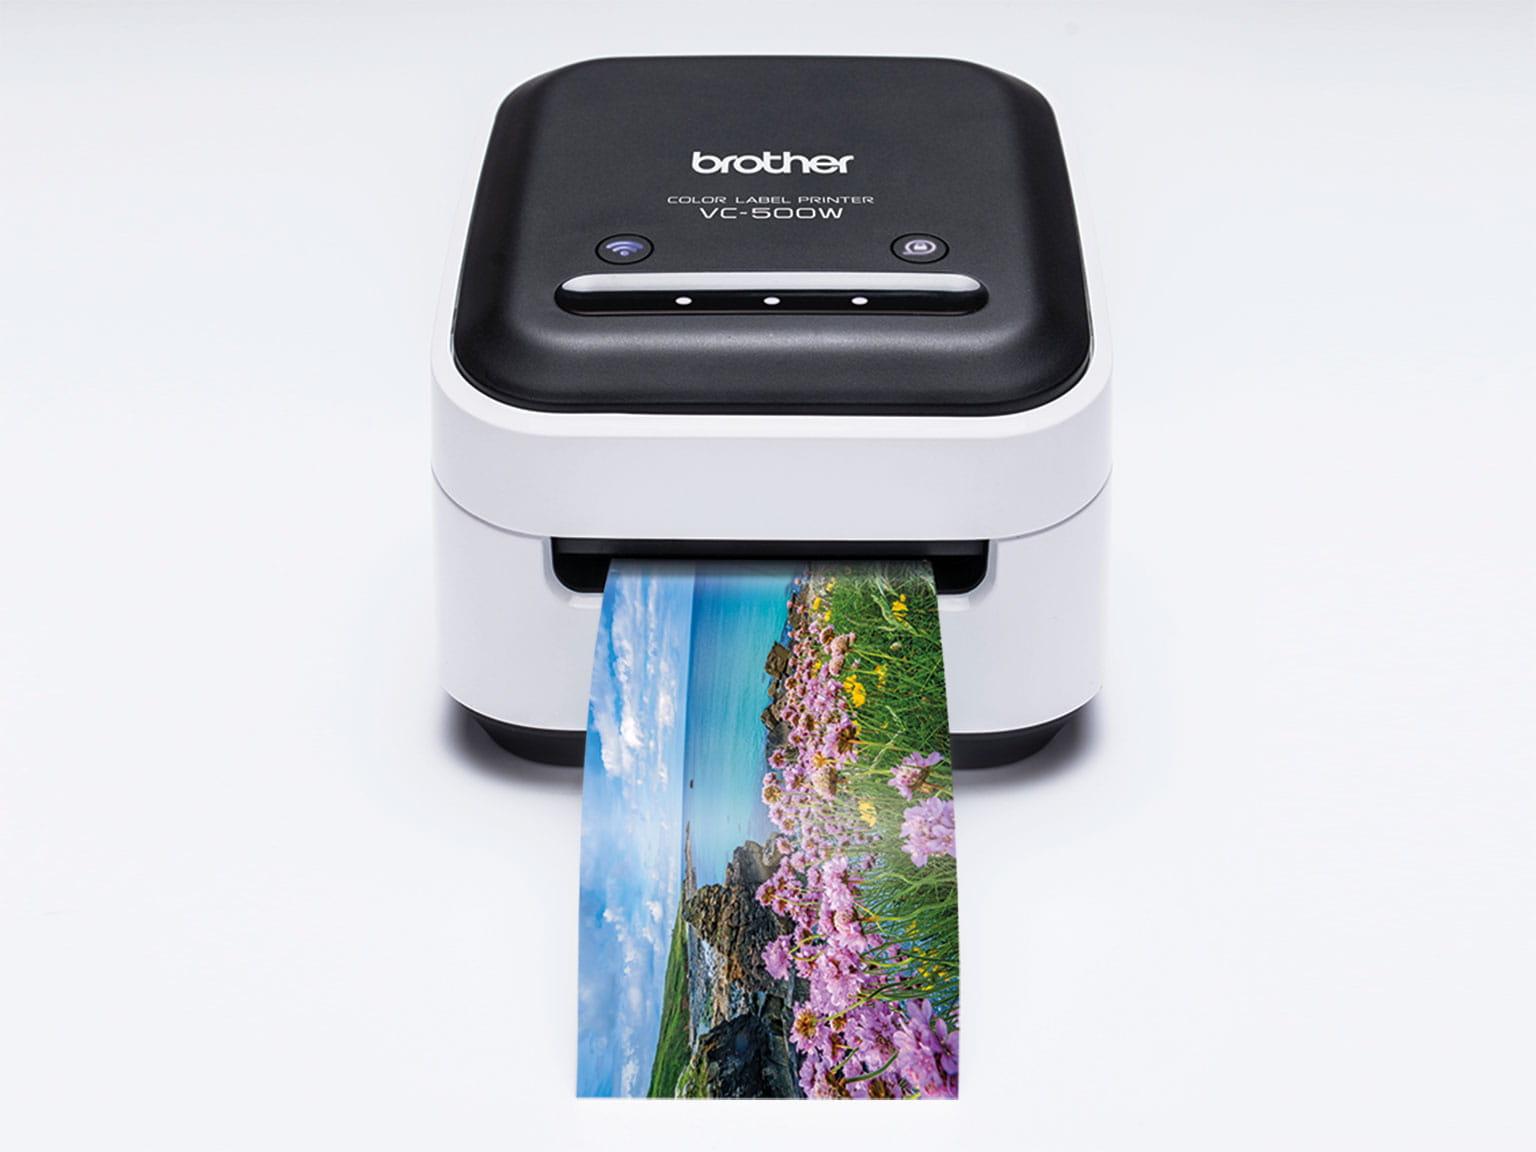 Panorama fotoutskrift fra Brother VC500W fargeetikettskriver